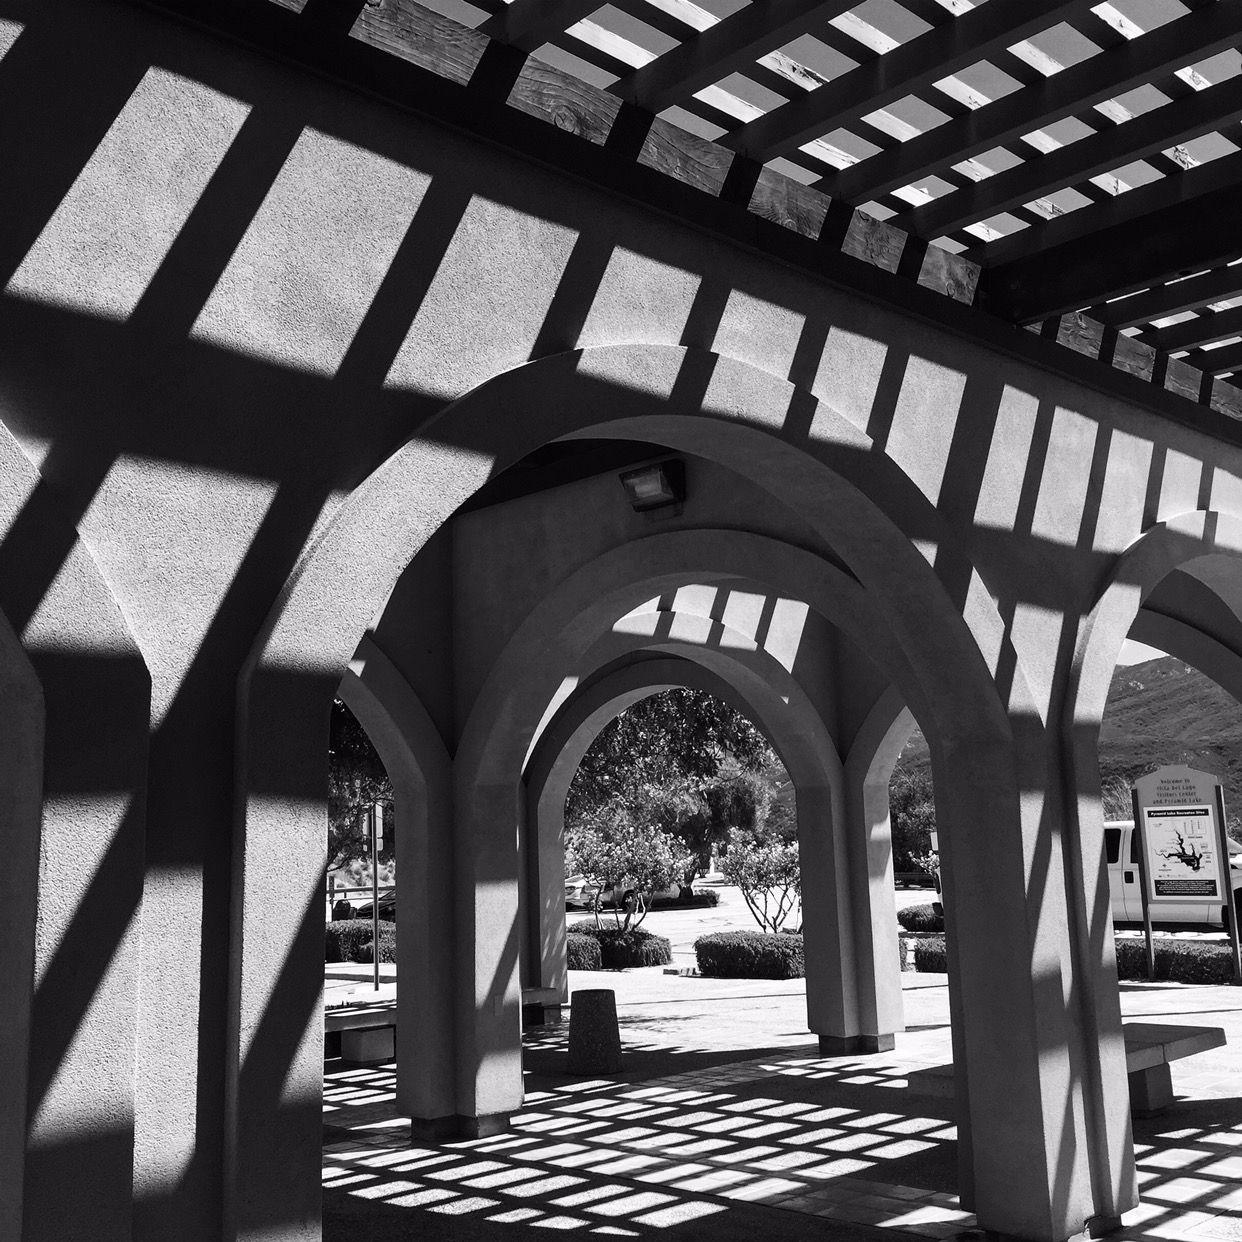 "#art #photography #blackandwhite #california #artchallenge #artaday ""criss-cross applesauce"""